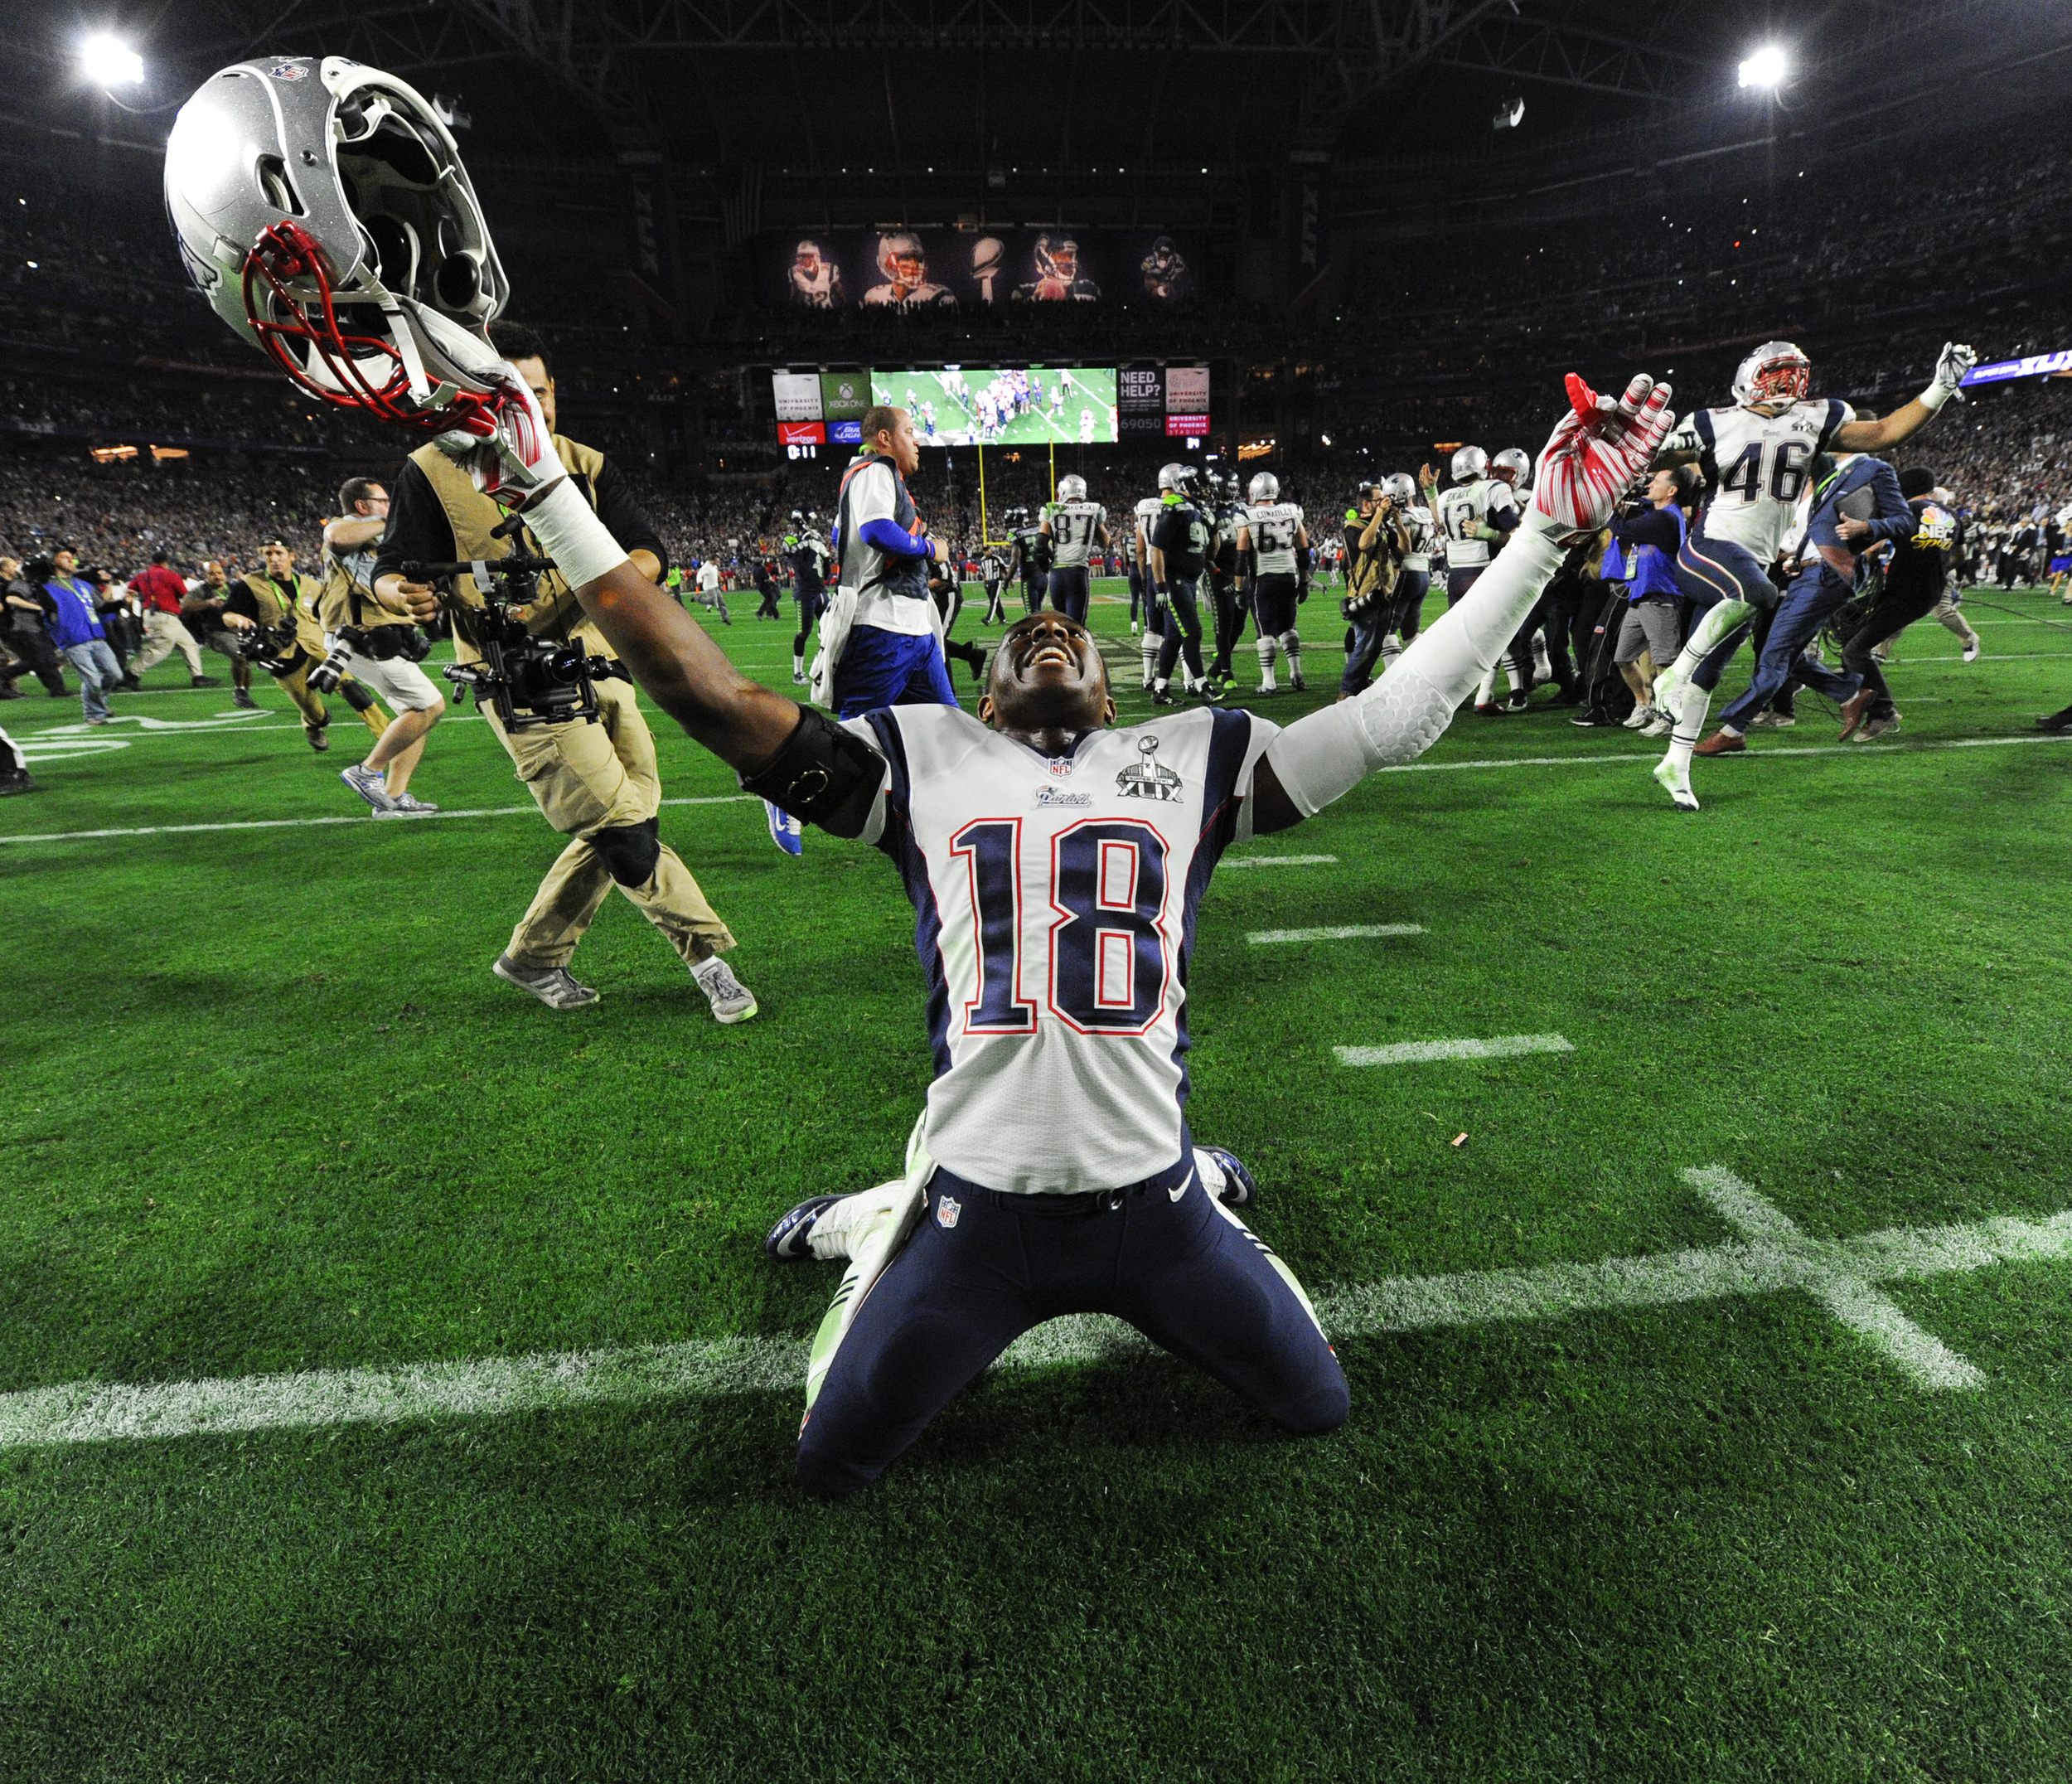 Feb 1, 2015; Glendale, AZ, USA;New England Patriots wide receiver Matthew Slater (18) celebrates the Patriots victory in Super Bowl XLIX at University of Phoenix Stadium.